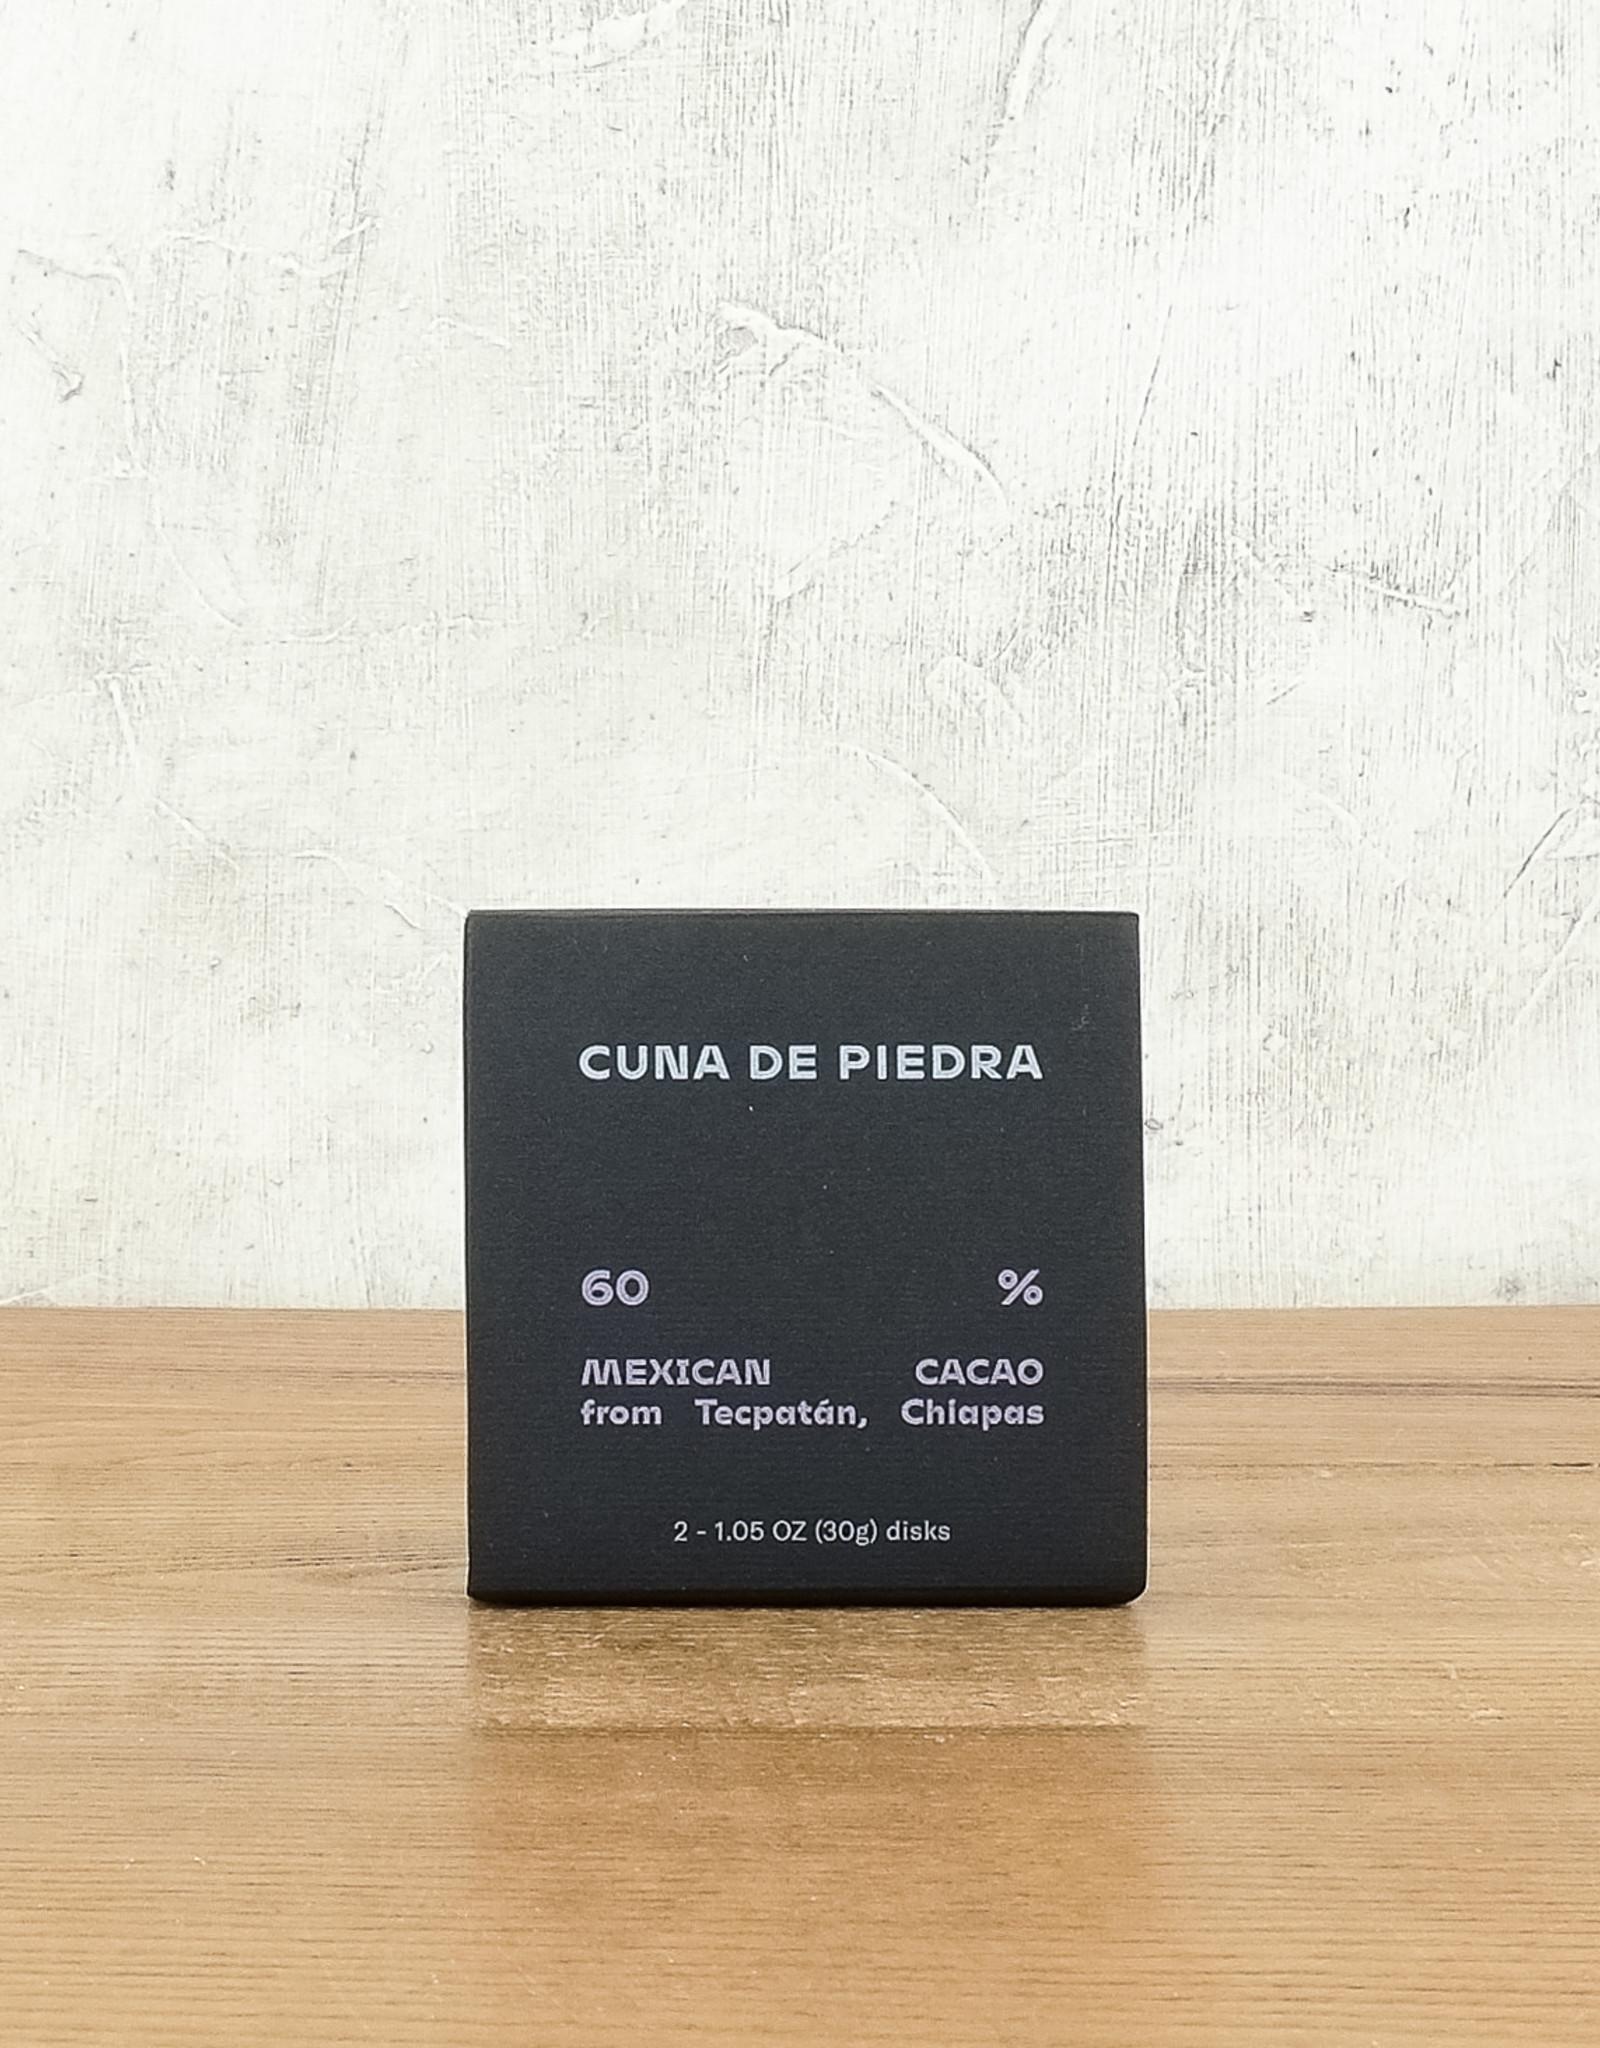 Cuna de Piedra Drinking Chocolate de Mesa Tecpatan